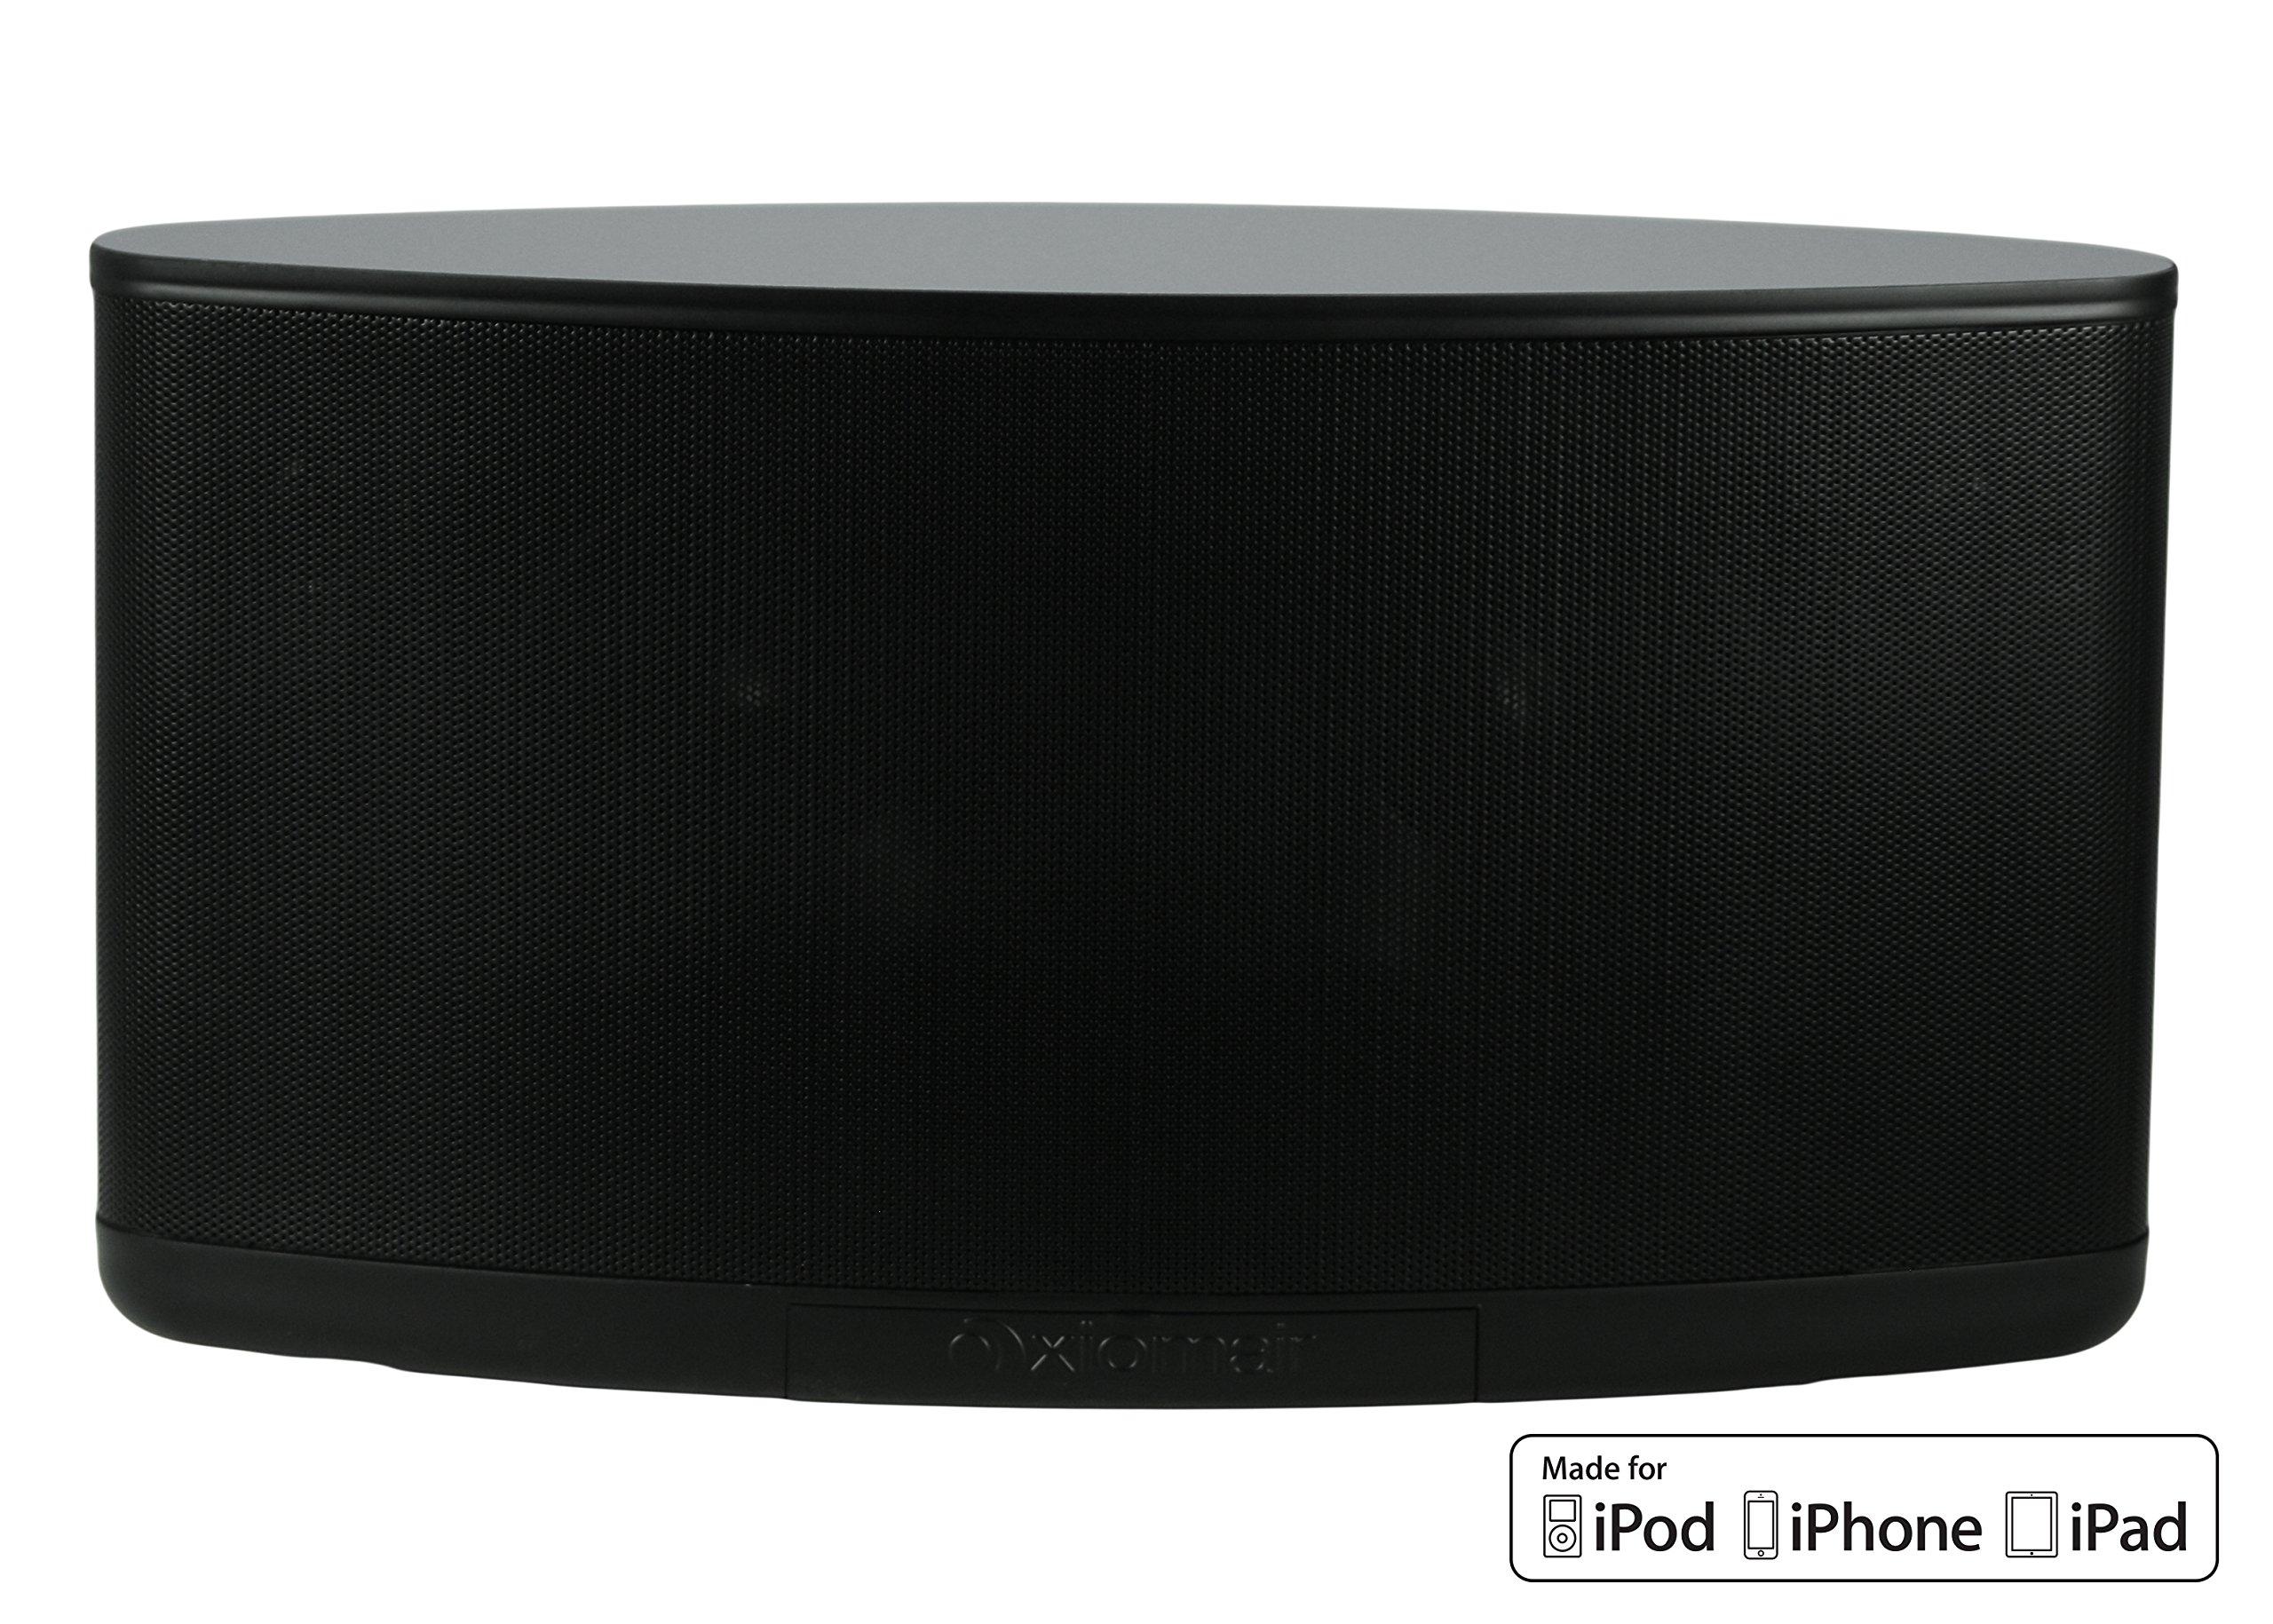 AxiomAir Portable Wireless Wifi Speaker - Airplay Enabled 150-Watt Audiophile Quality Speaker by Axiom (Image #1)